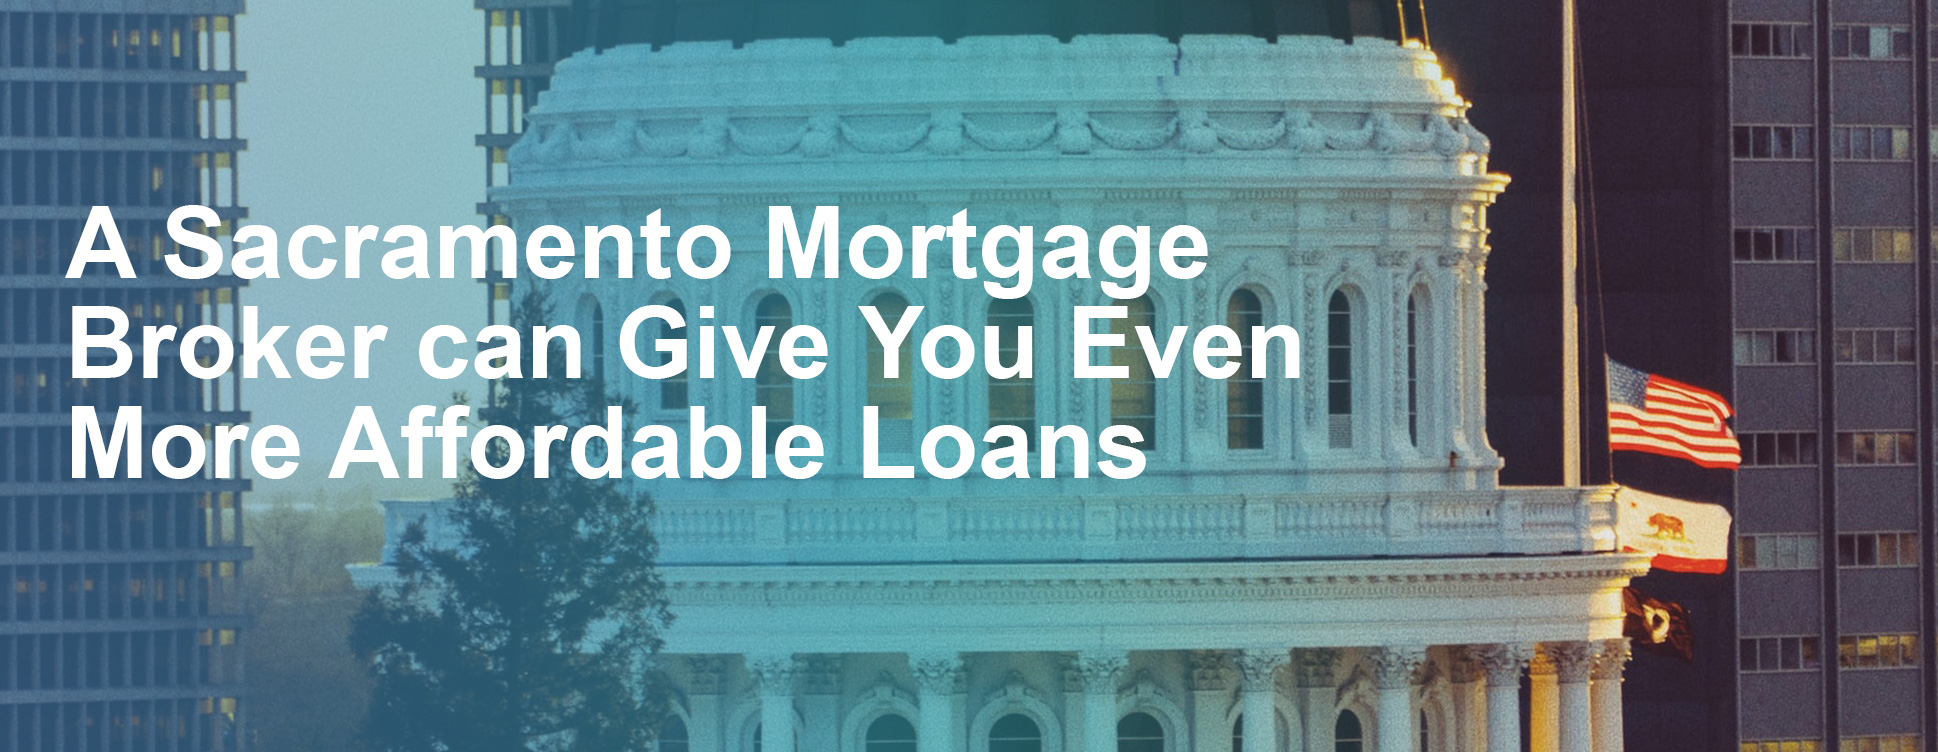 sacramento mortgage broker west coast mortgage group